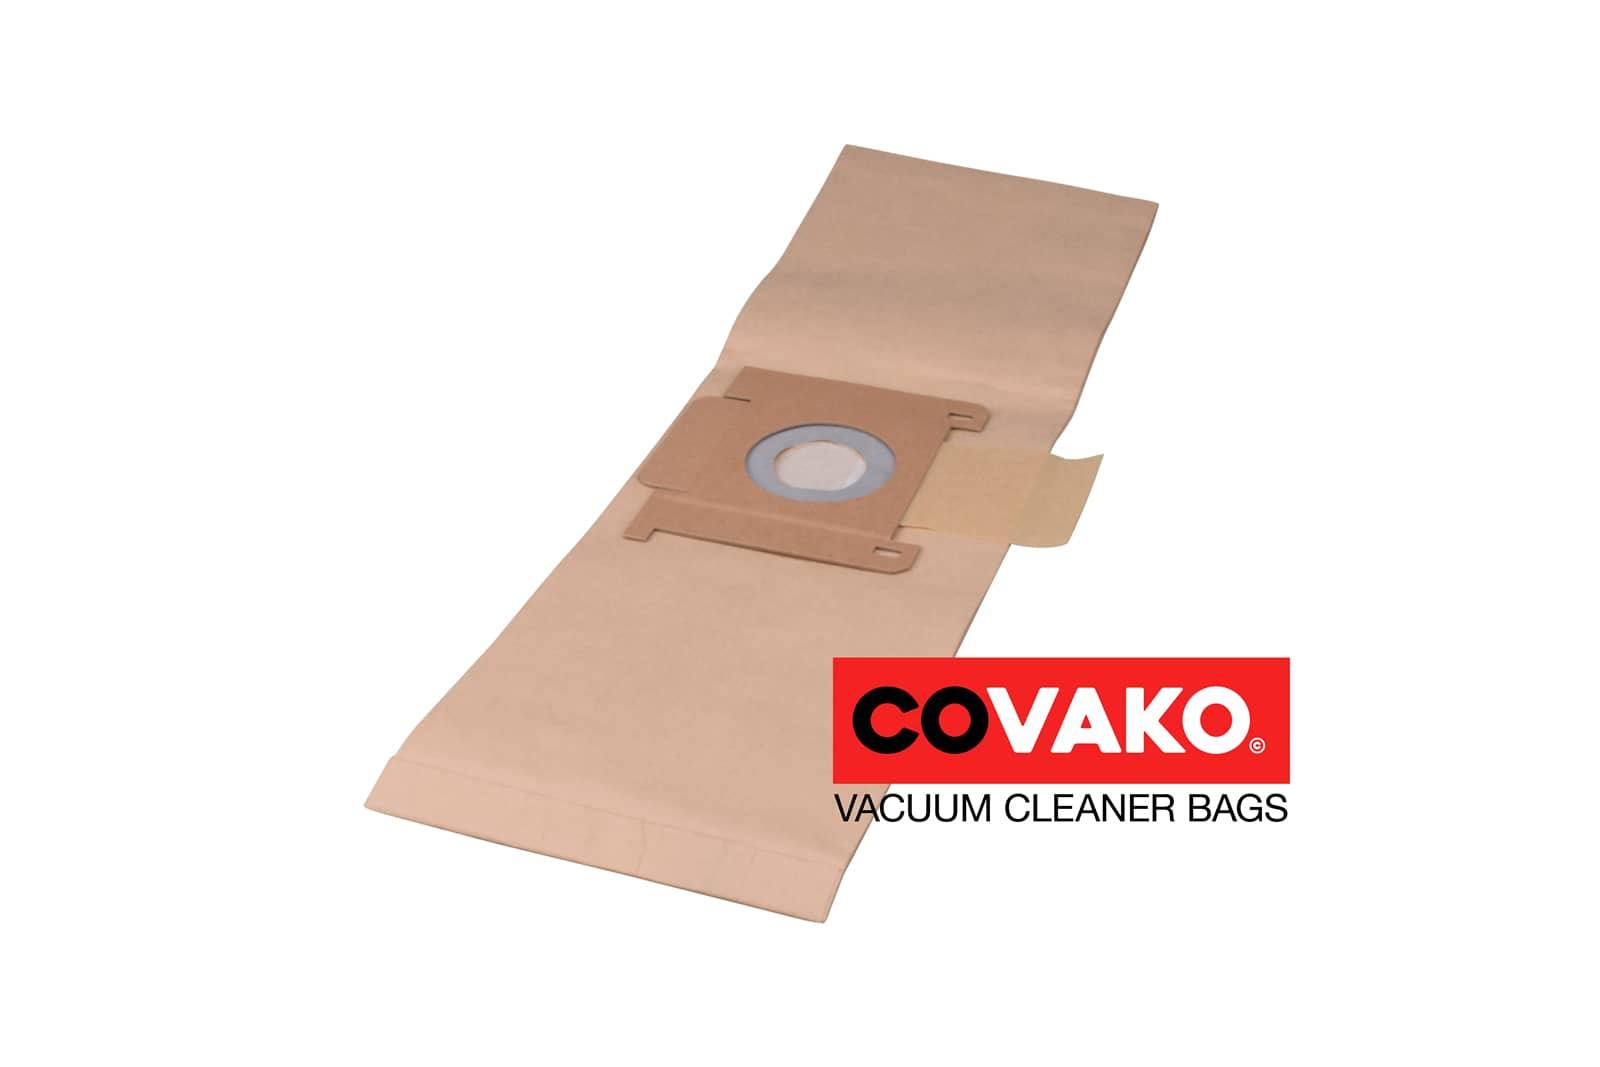 Fast I-vac C5 / Papier - Fast Staubsaugerbeutel